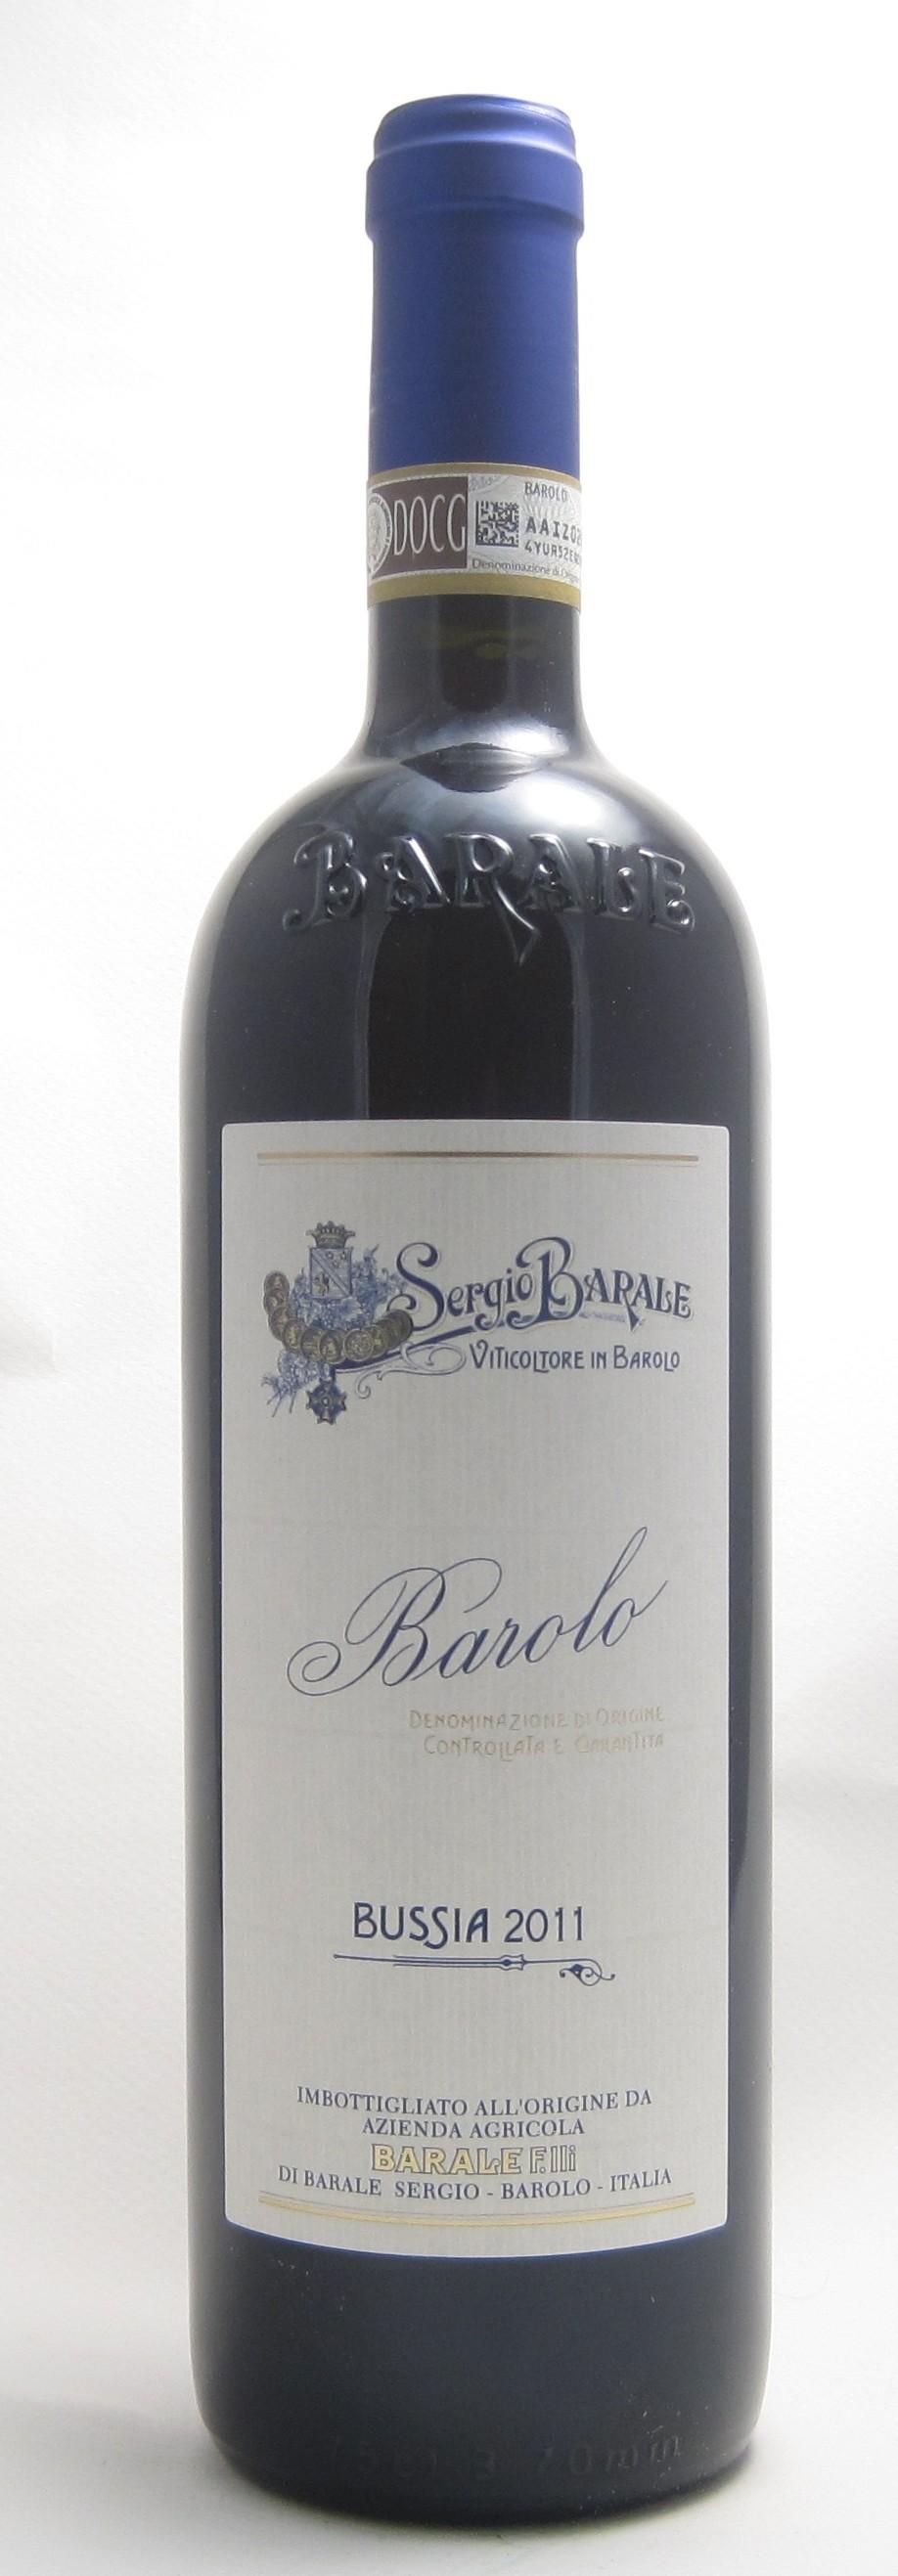 Barale 'Sergio Barale' Barolo Bussia